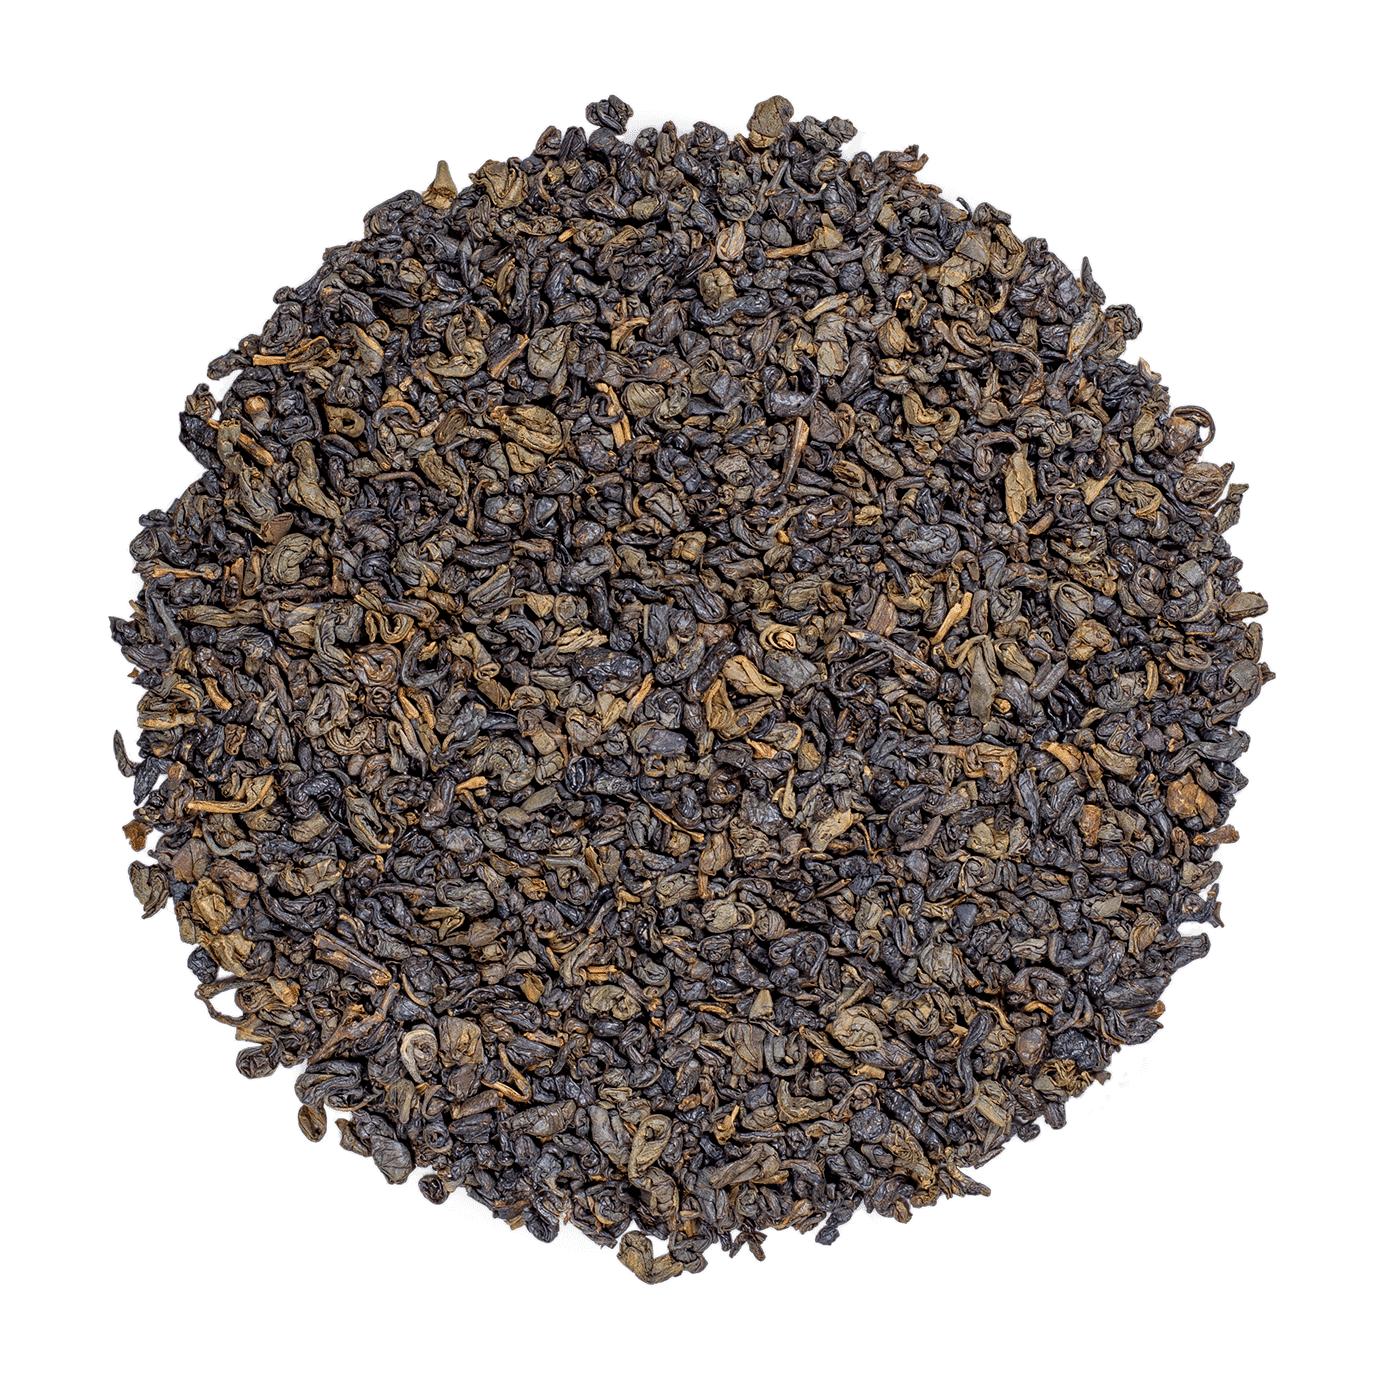 KUSMI TEA Thé vert Gunpowder bio - Thé vert de Chine - Thé en vrac - Kusmi Tea